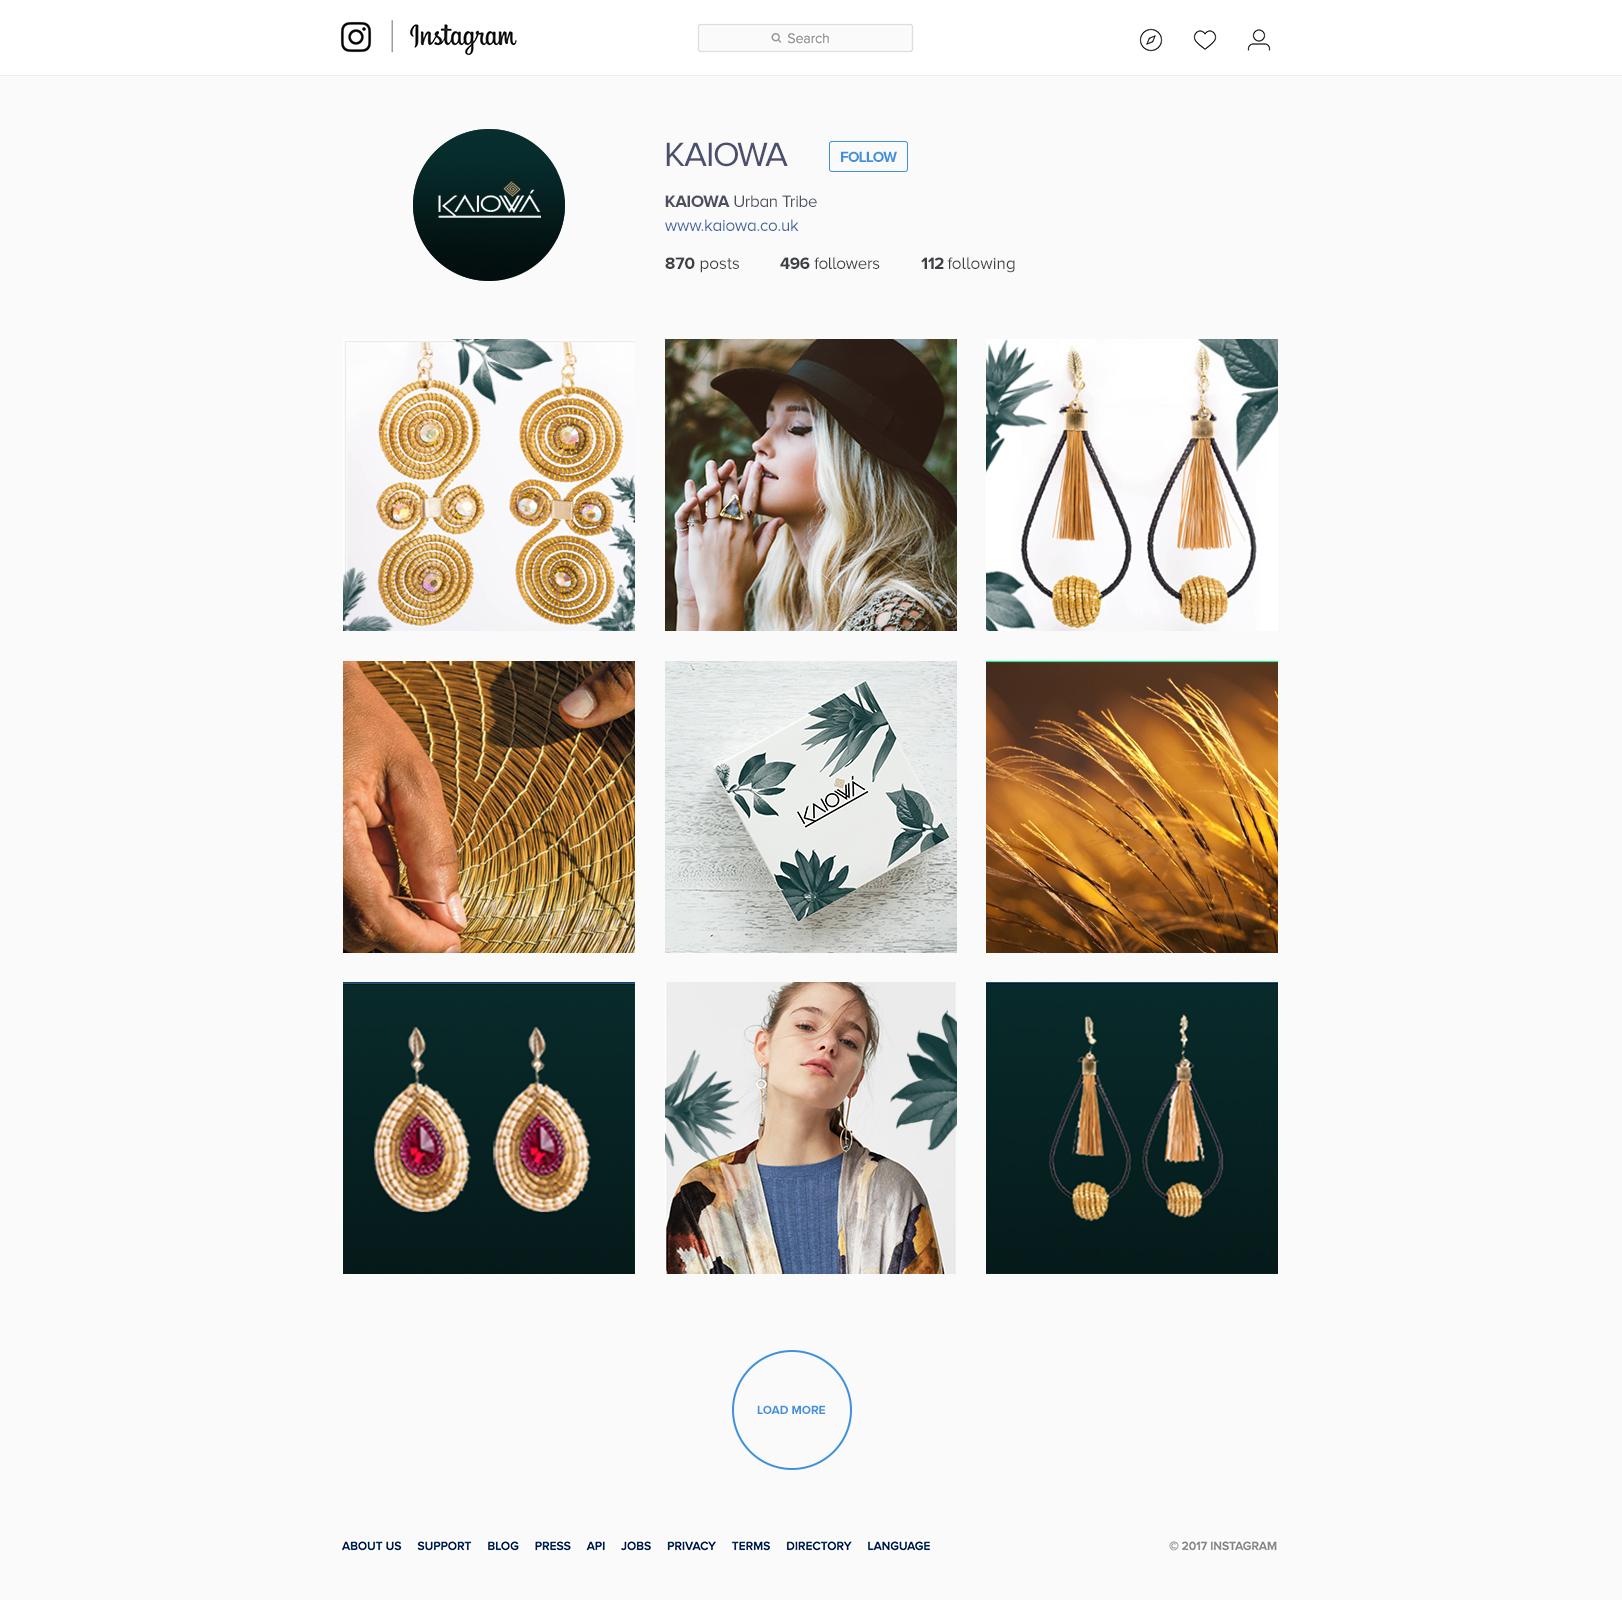 Instagram_web_template_KAIOWAV2.jpg